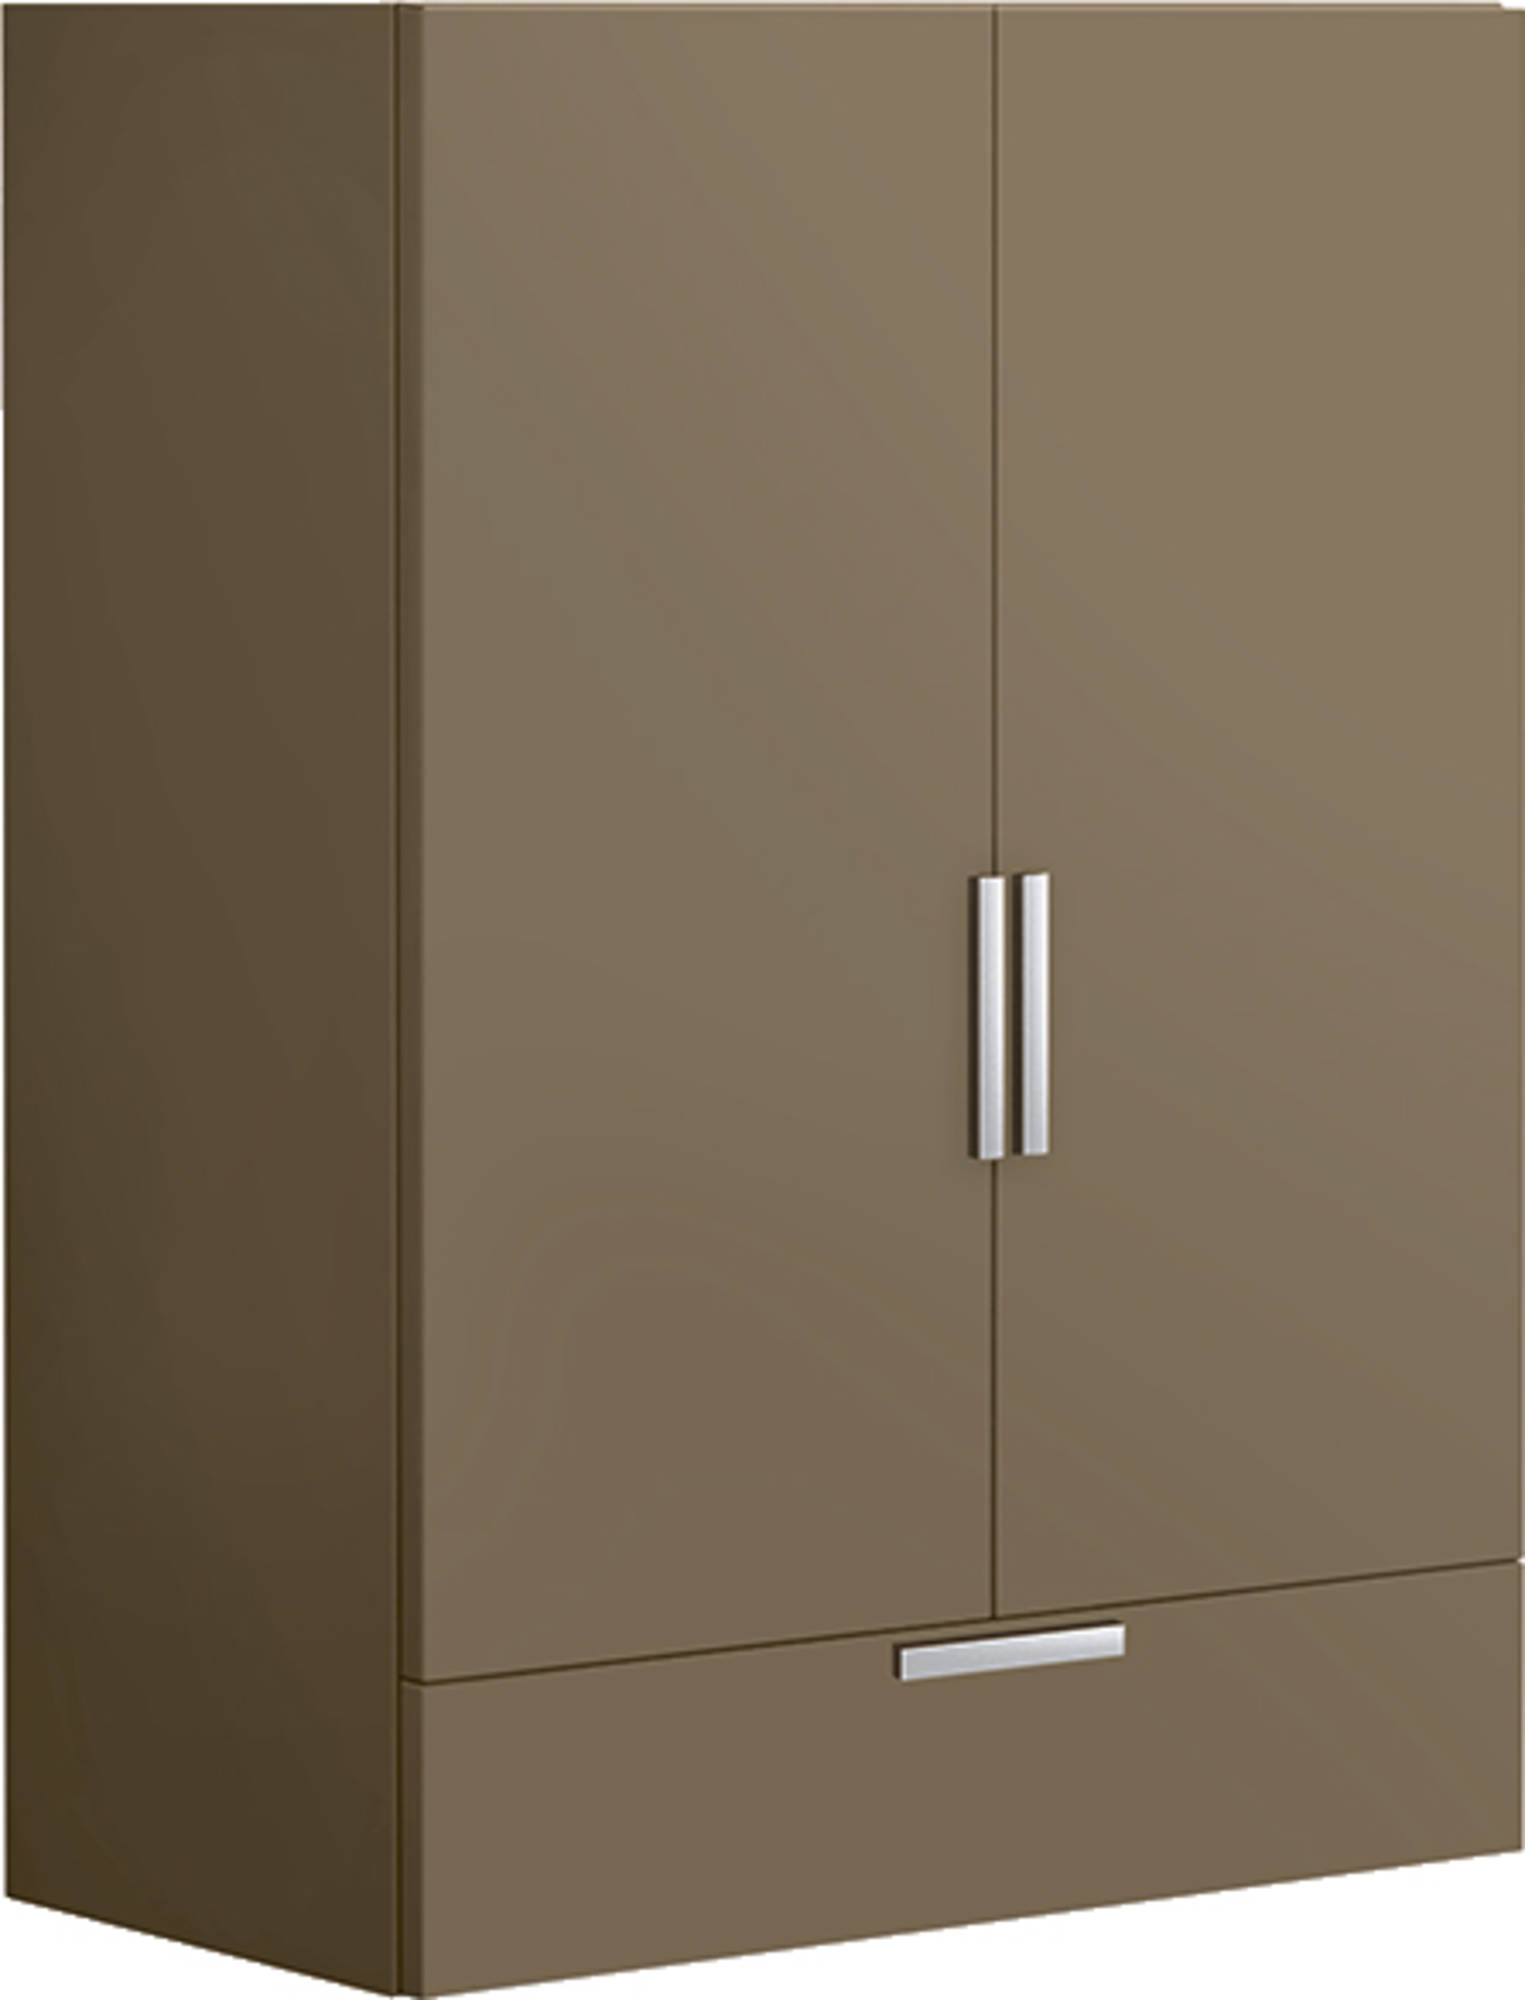 Villeroy & Boch Sentique wandkast m. 2 deuren en 1 lade 95.7x70x37cm glanswit